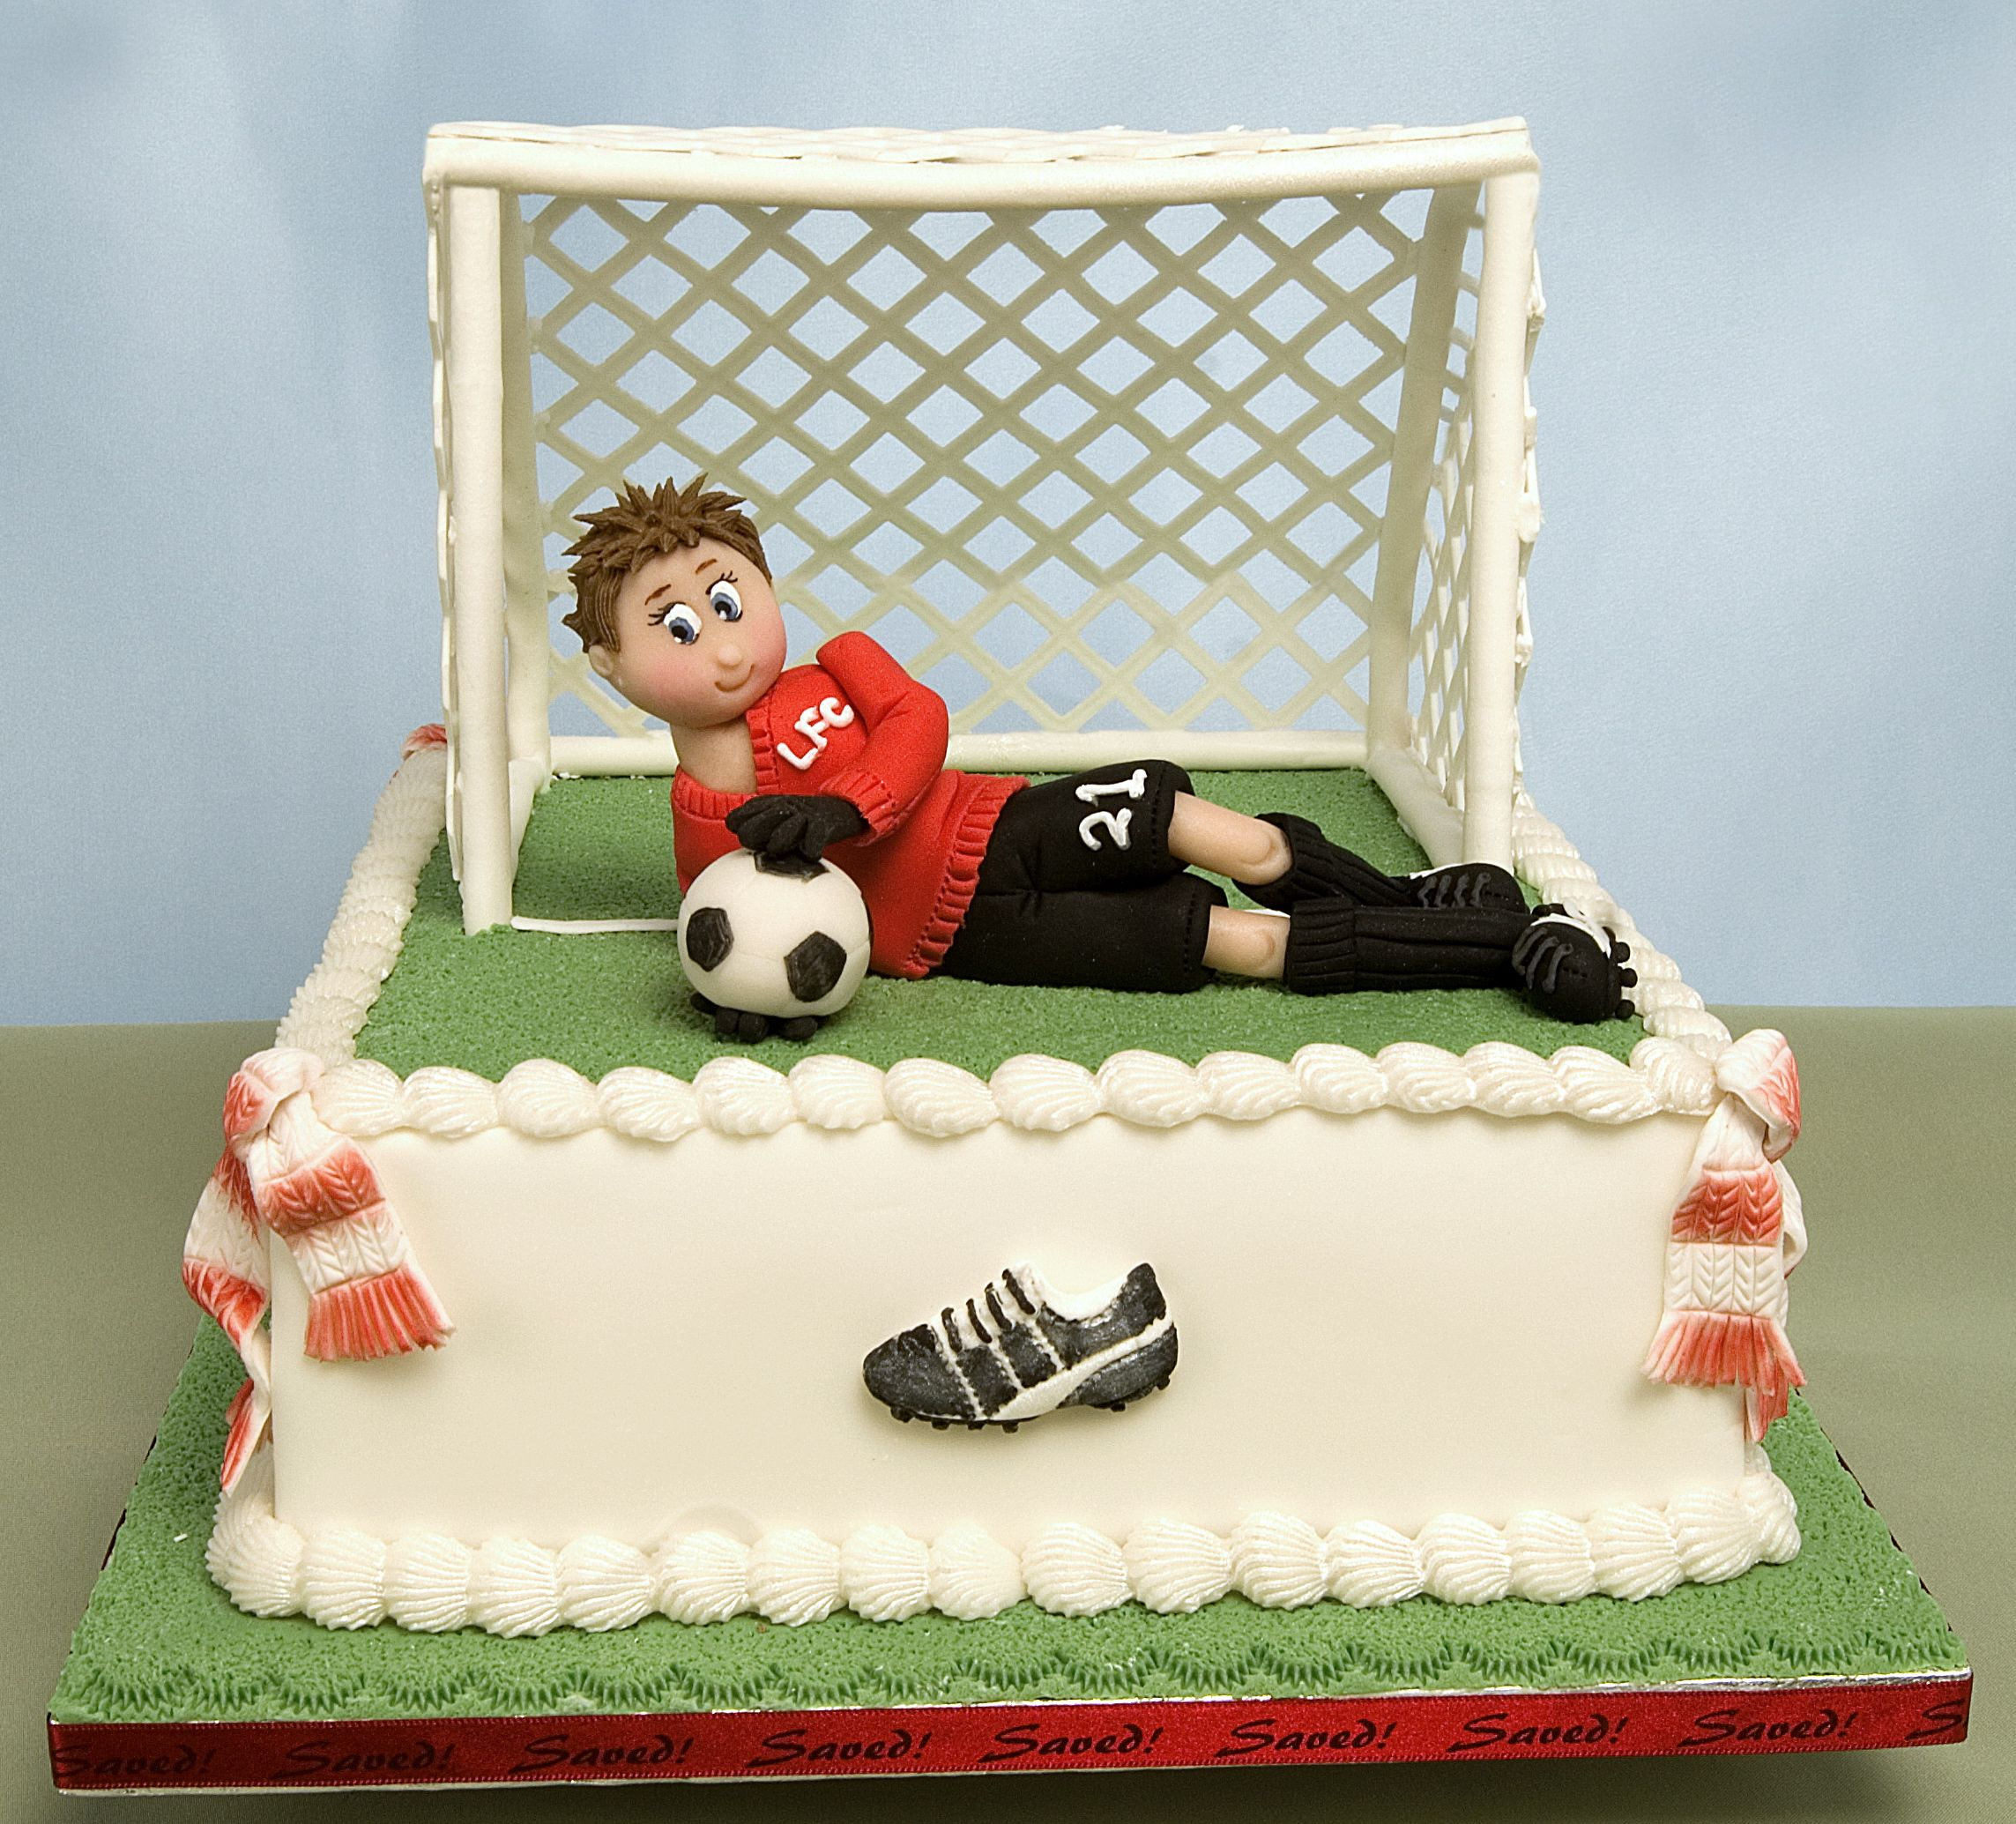 Football cake great idea for boys or older gentlemans